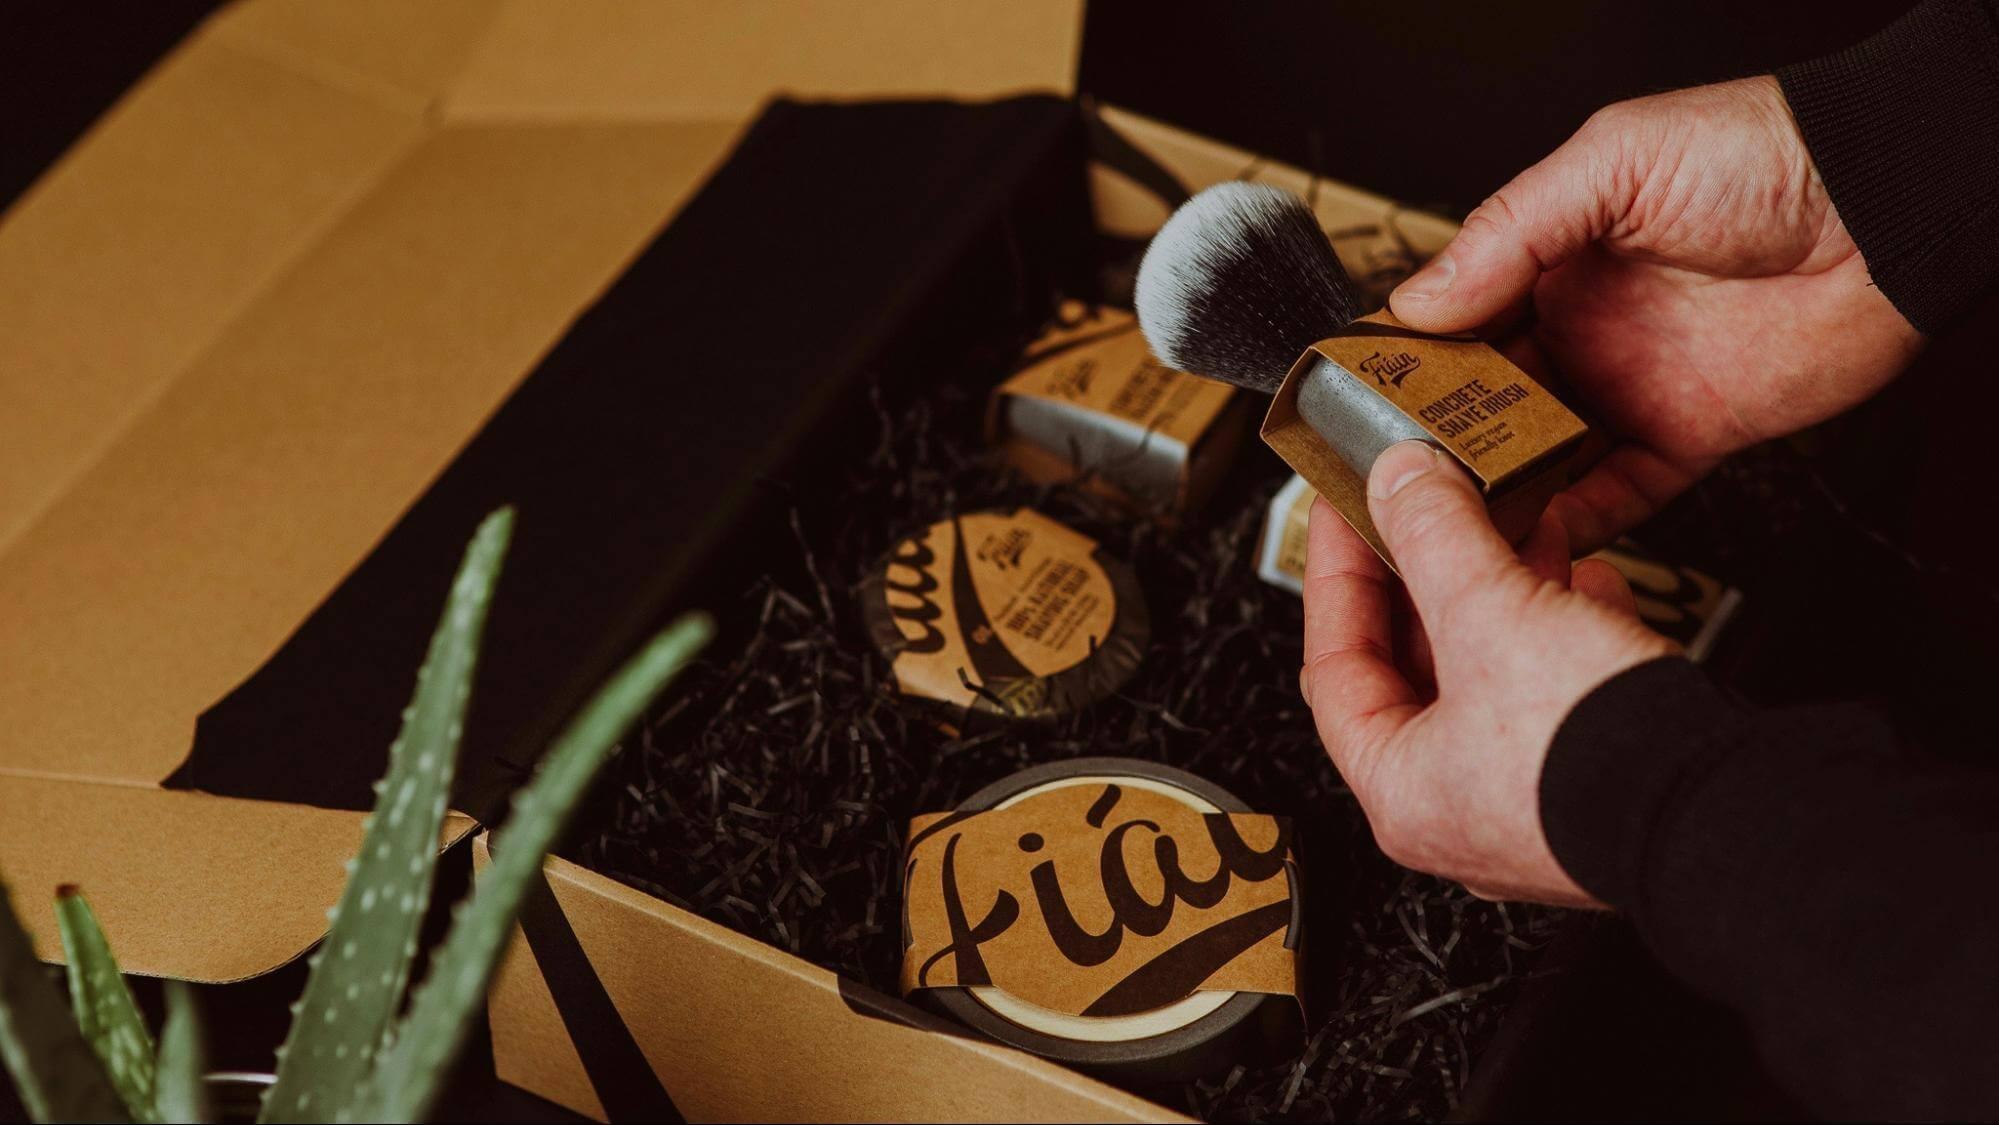 Unboxing vlastní design krabičky